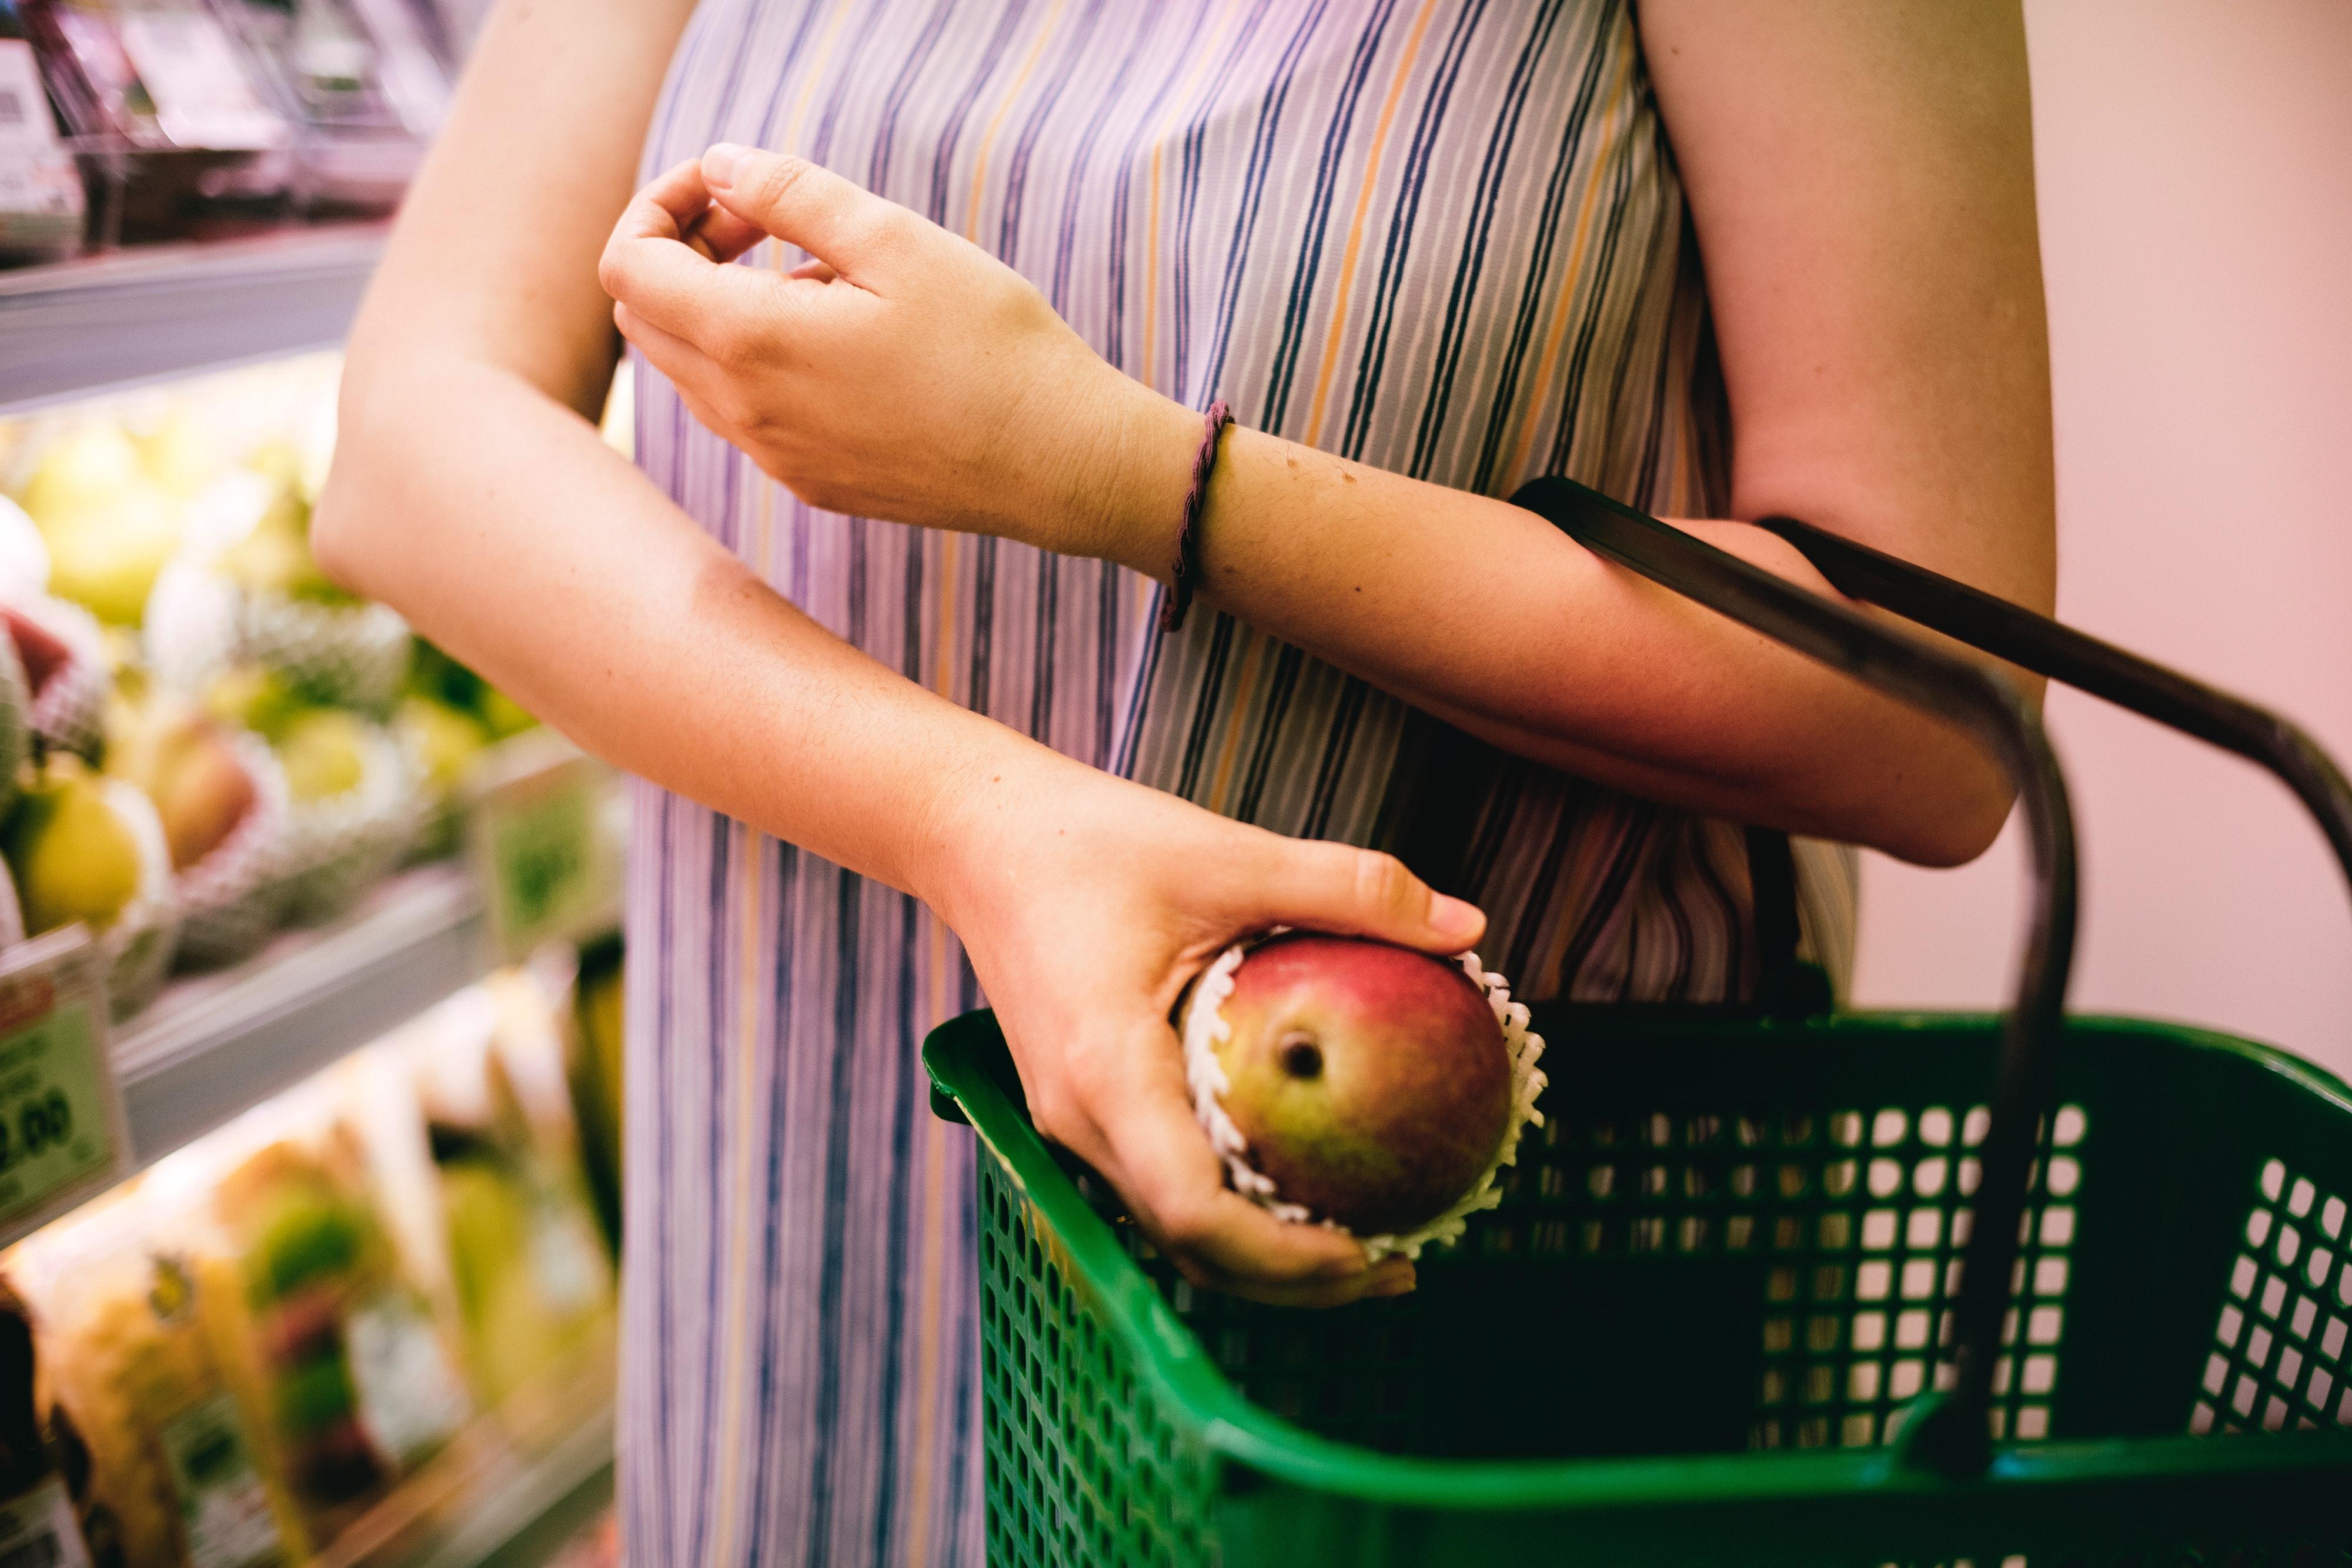 woman putting mango in a shopping basket